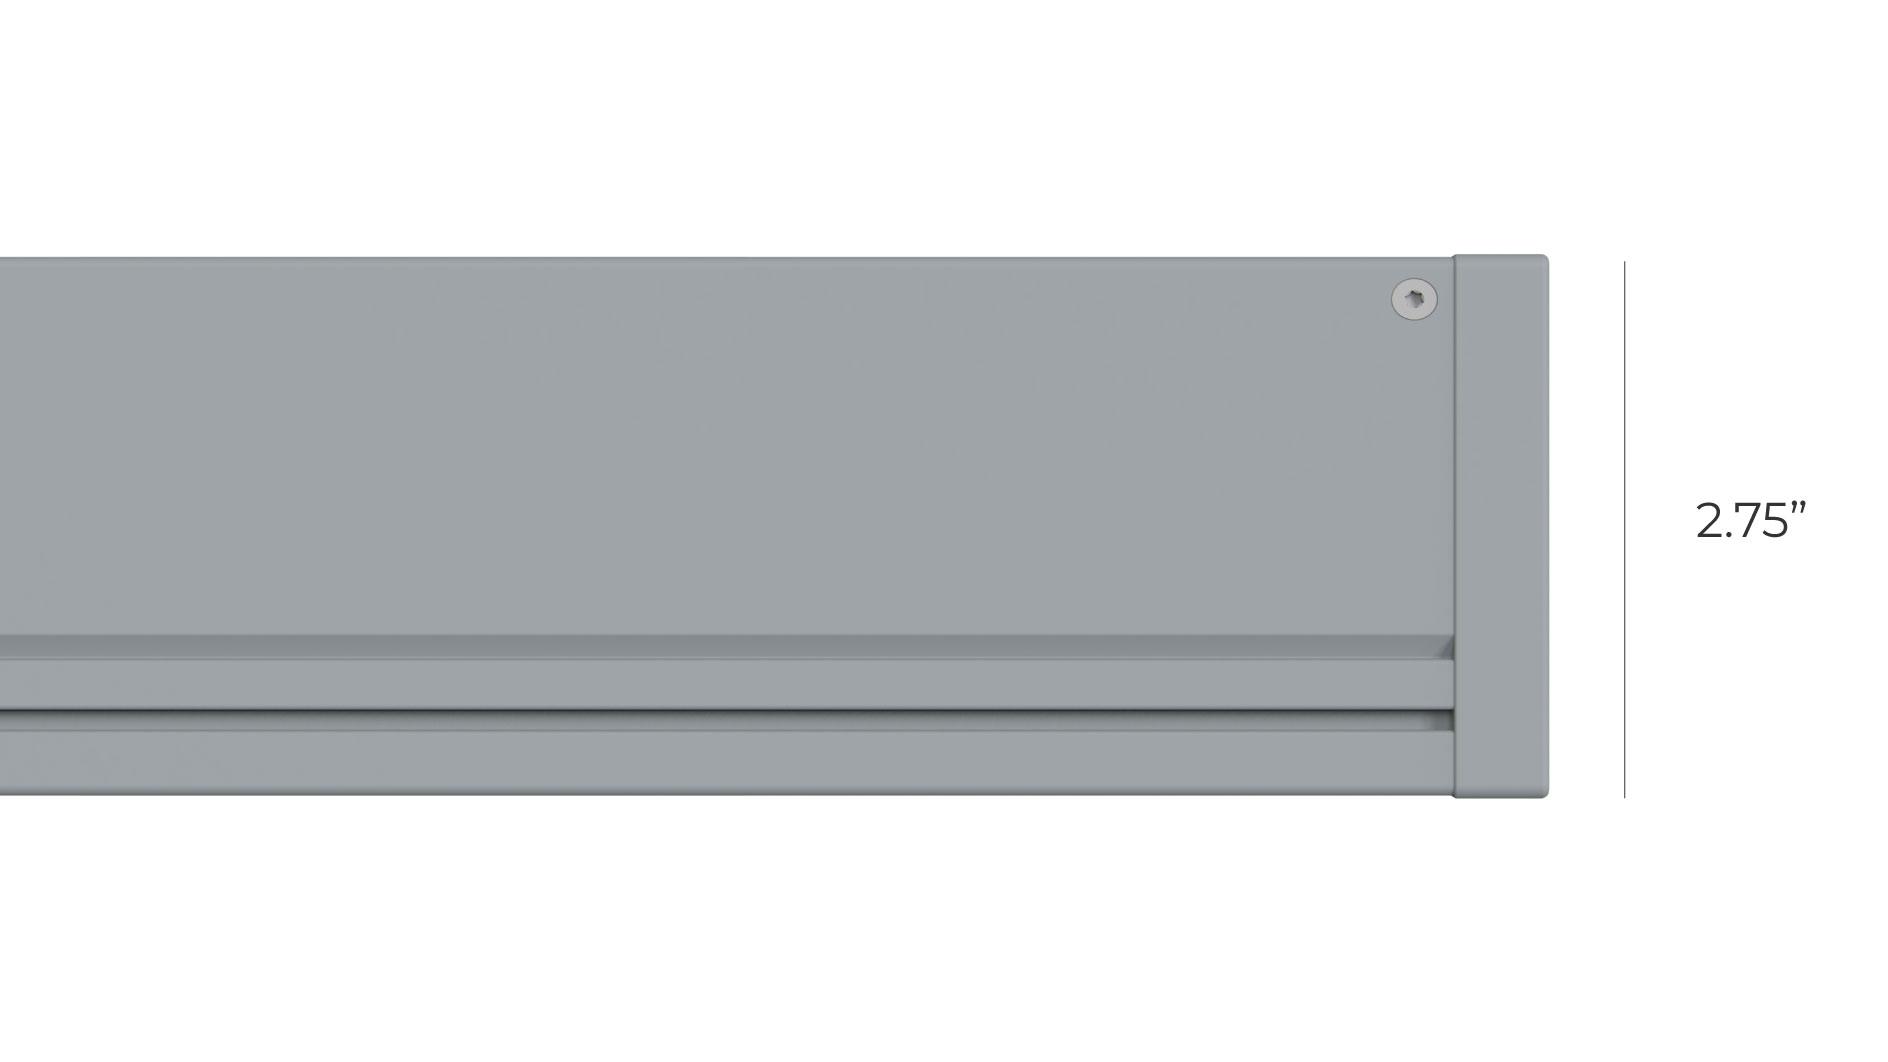 nano-box-size-feature.jpg